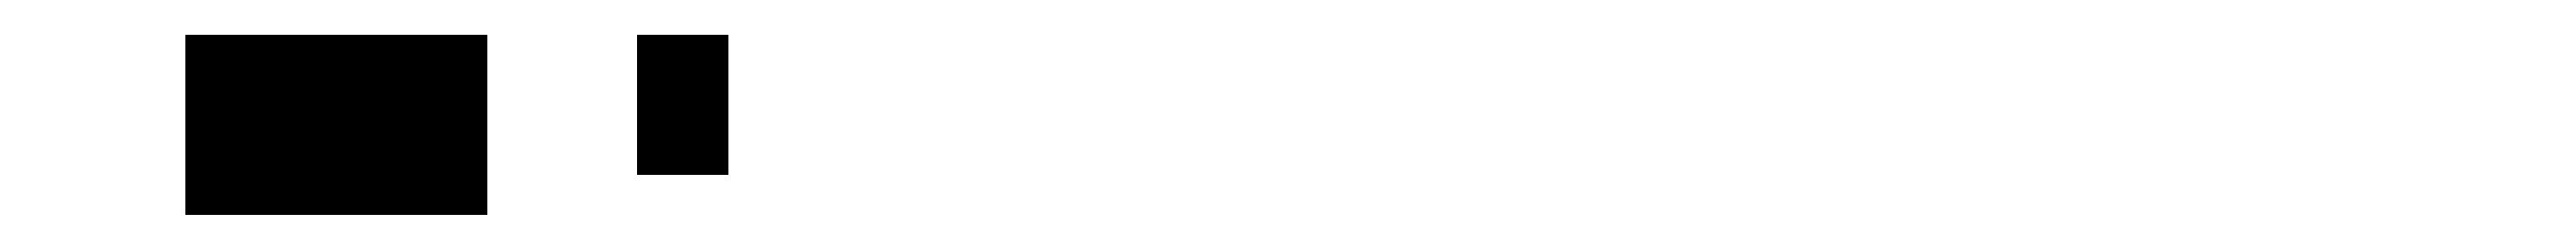 Typeface-Heimat-Mono-F03-Atlas-Font-Foundry